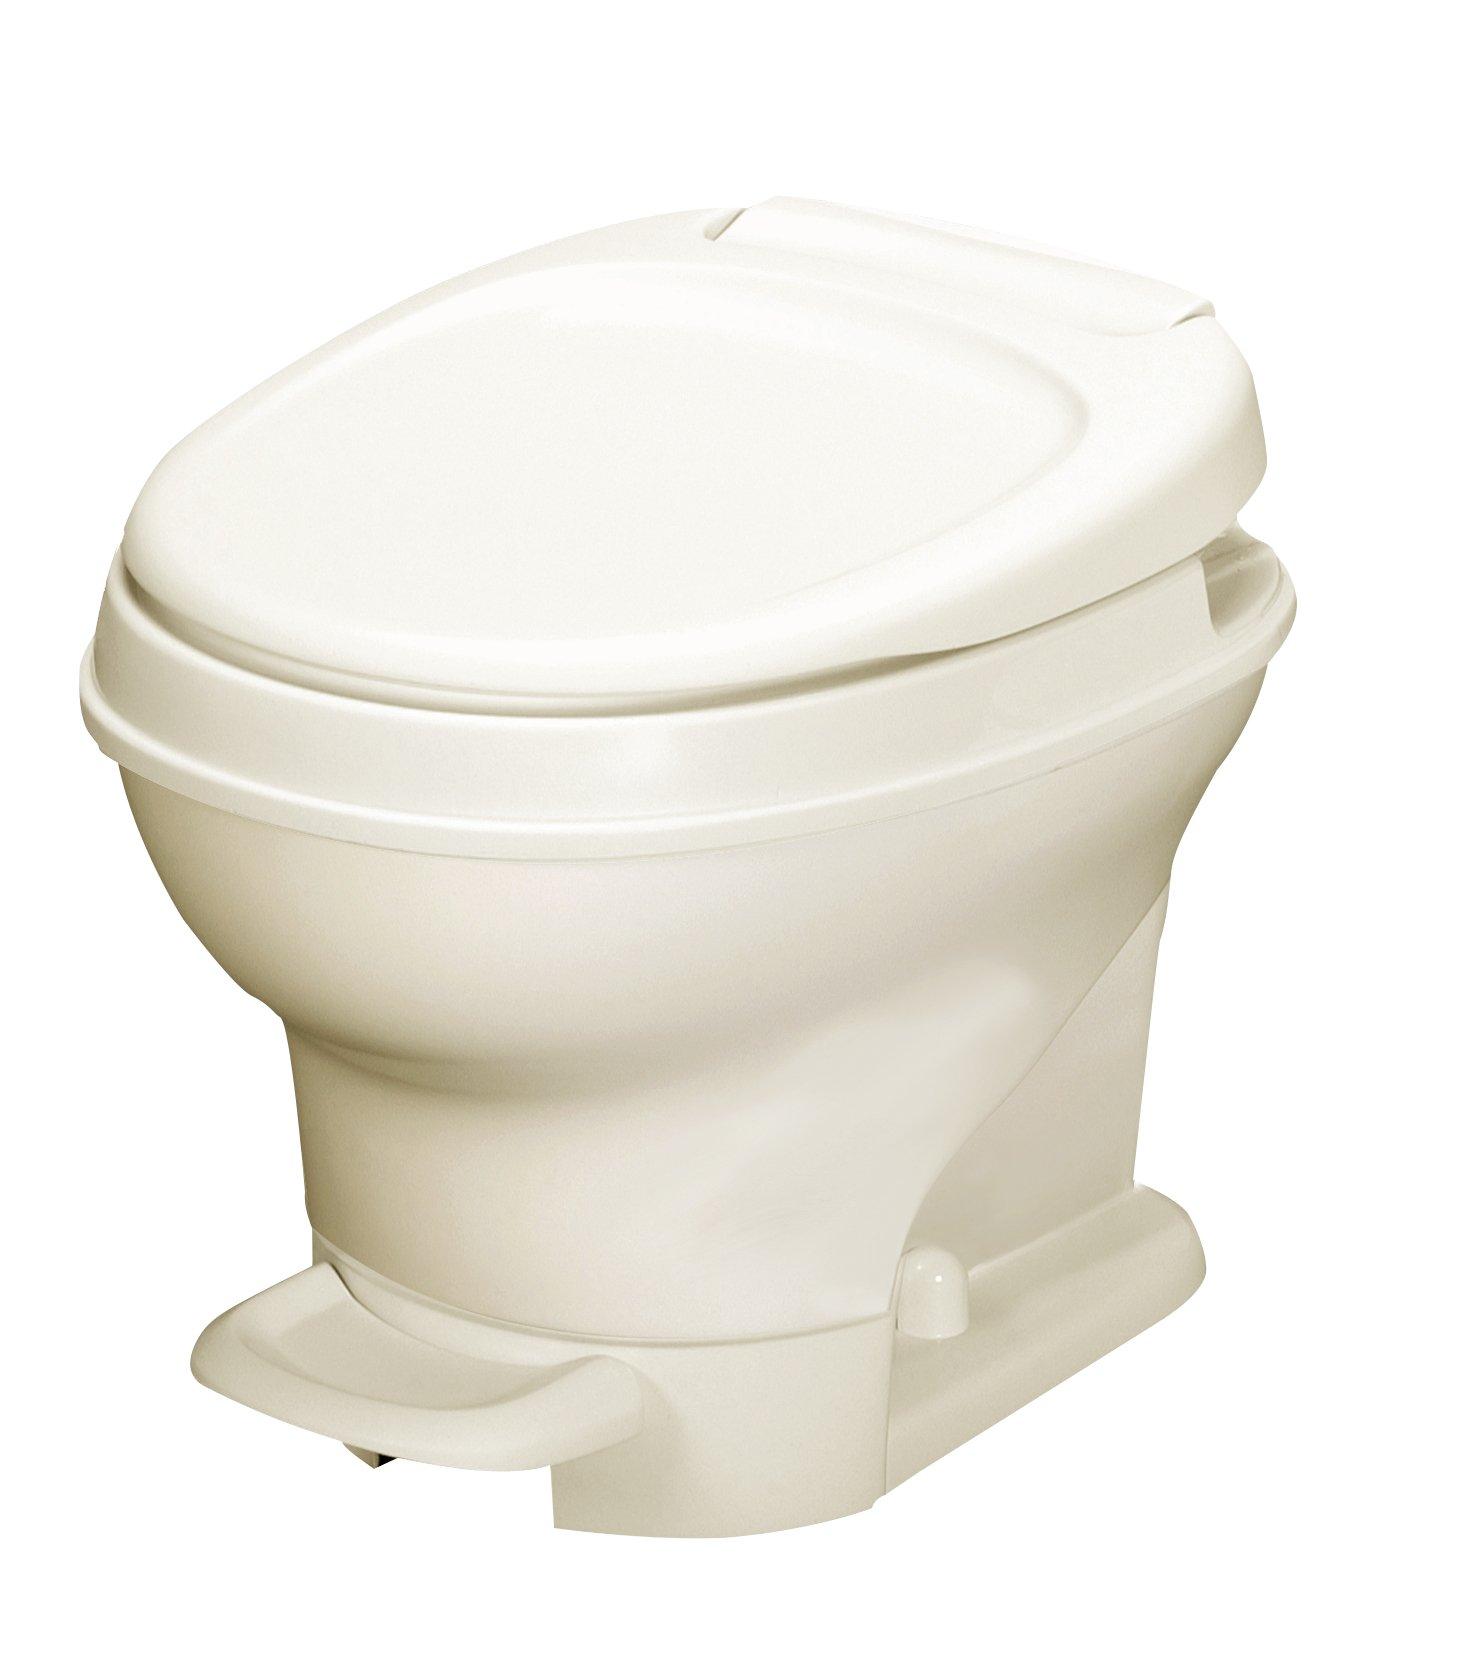 Thetford 31651 Parchment Aqua Magic V RV Toilet Pedal Flush-Low Profile-White Color-Thetford-31650 by Thetford (Image #3)